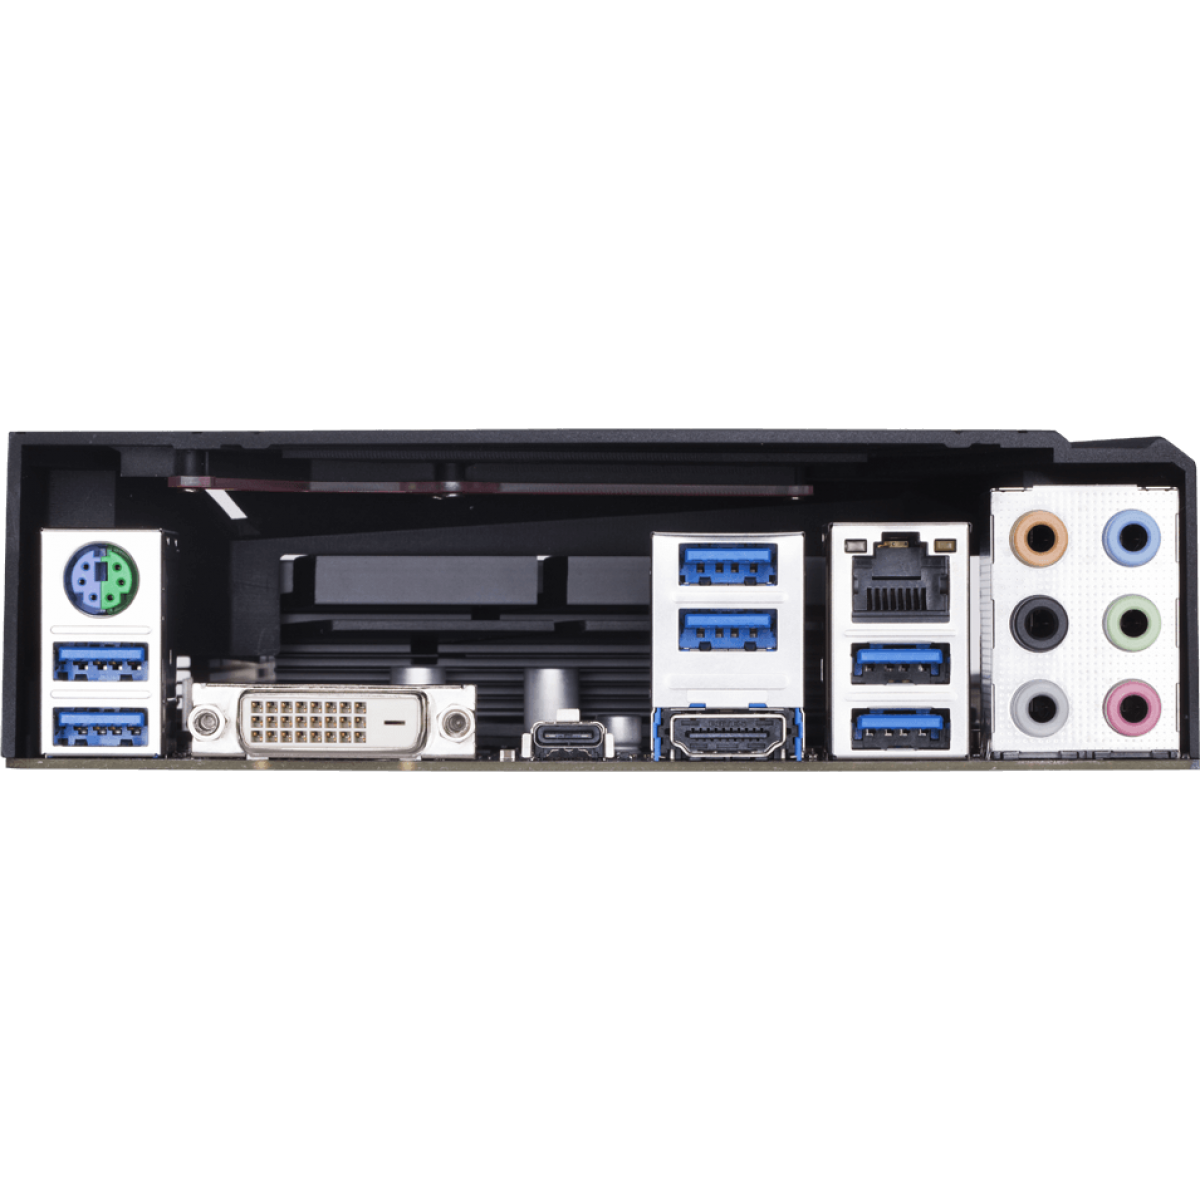 Placa Mãe Gigabyte Z370M AORUS Gaming, Chipset Z370, Intel LGA 1151, mATX, DDR4